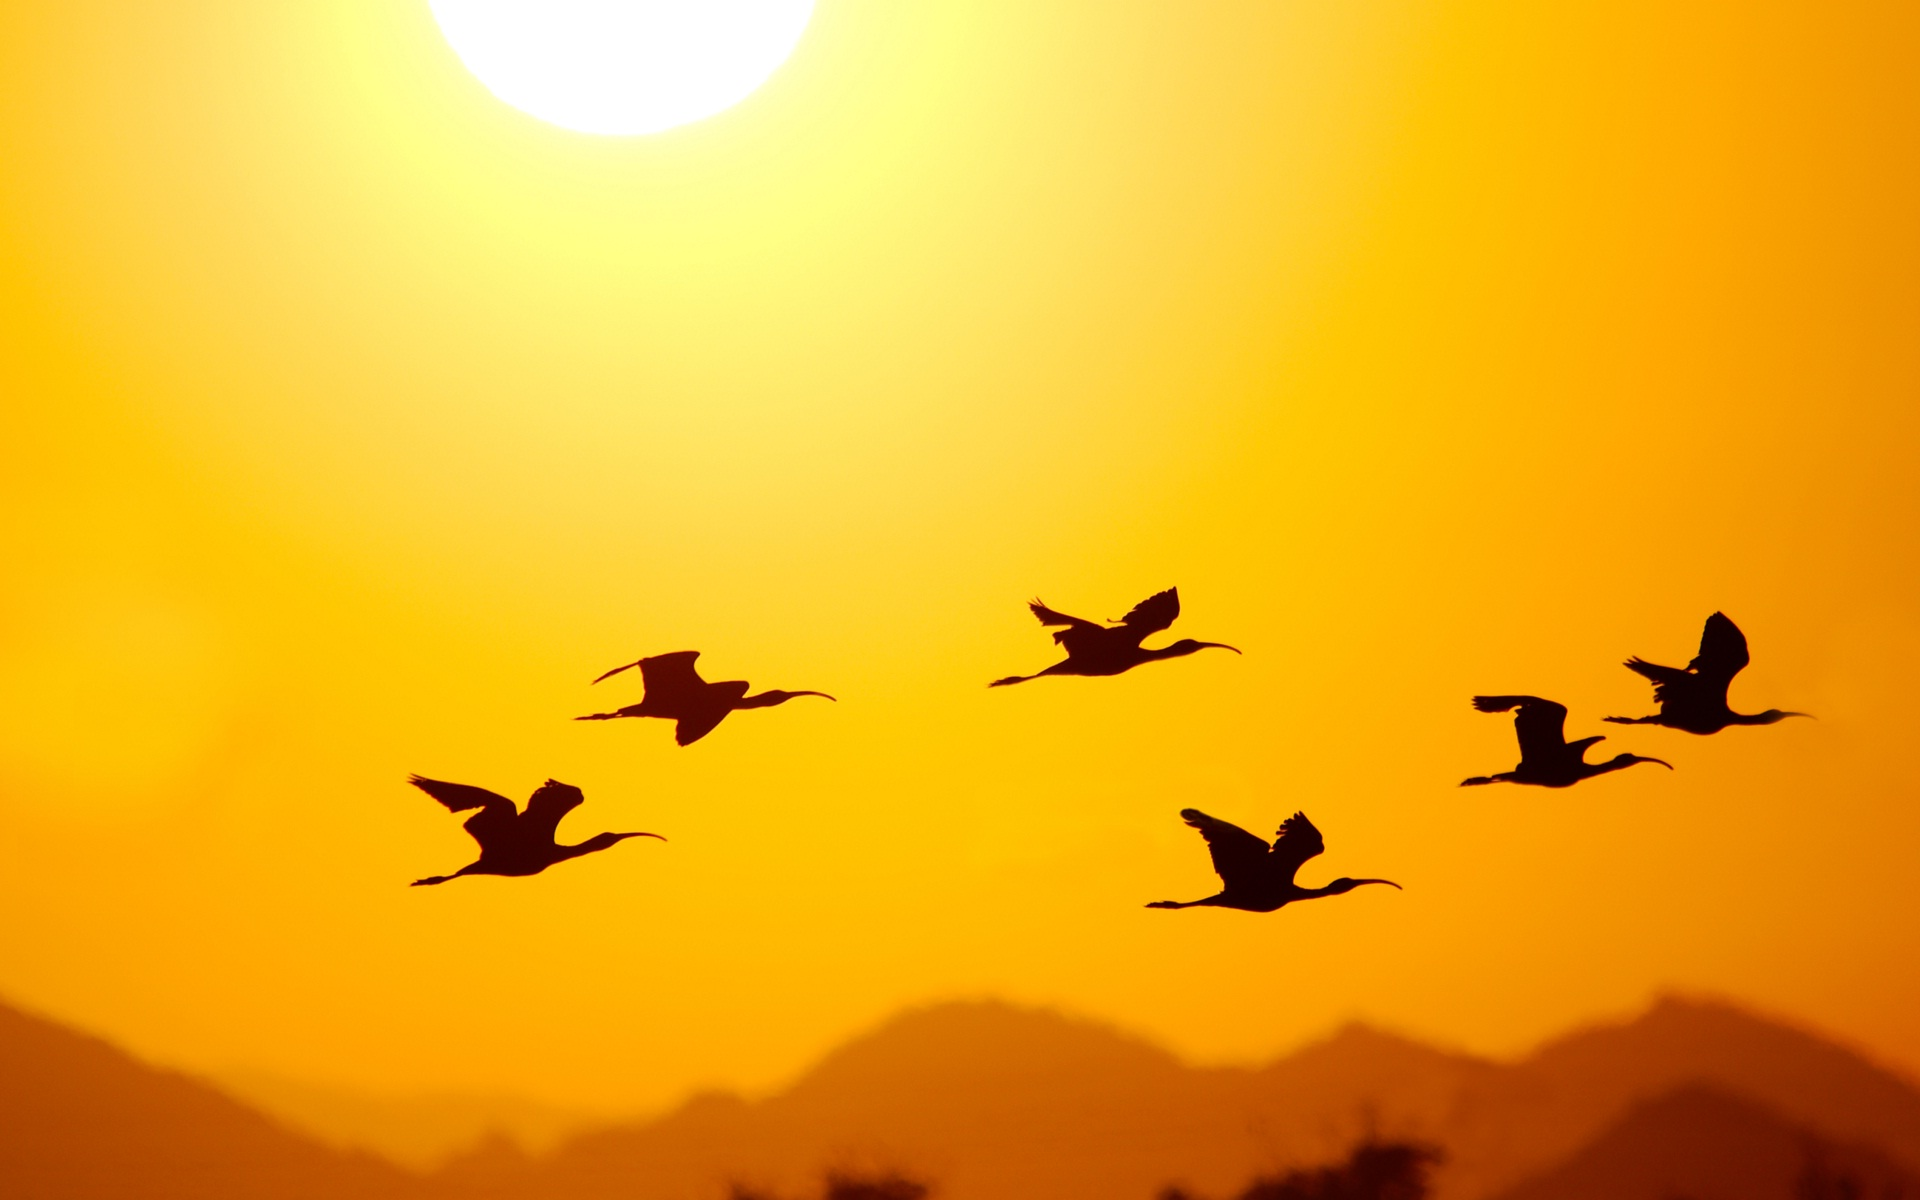 1920x1200 Images Of Good Morning Sunshine Sky